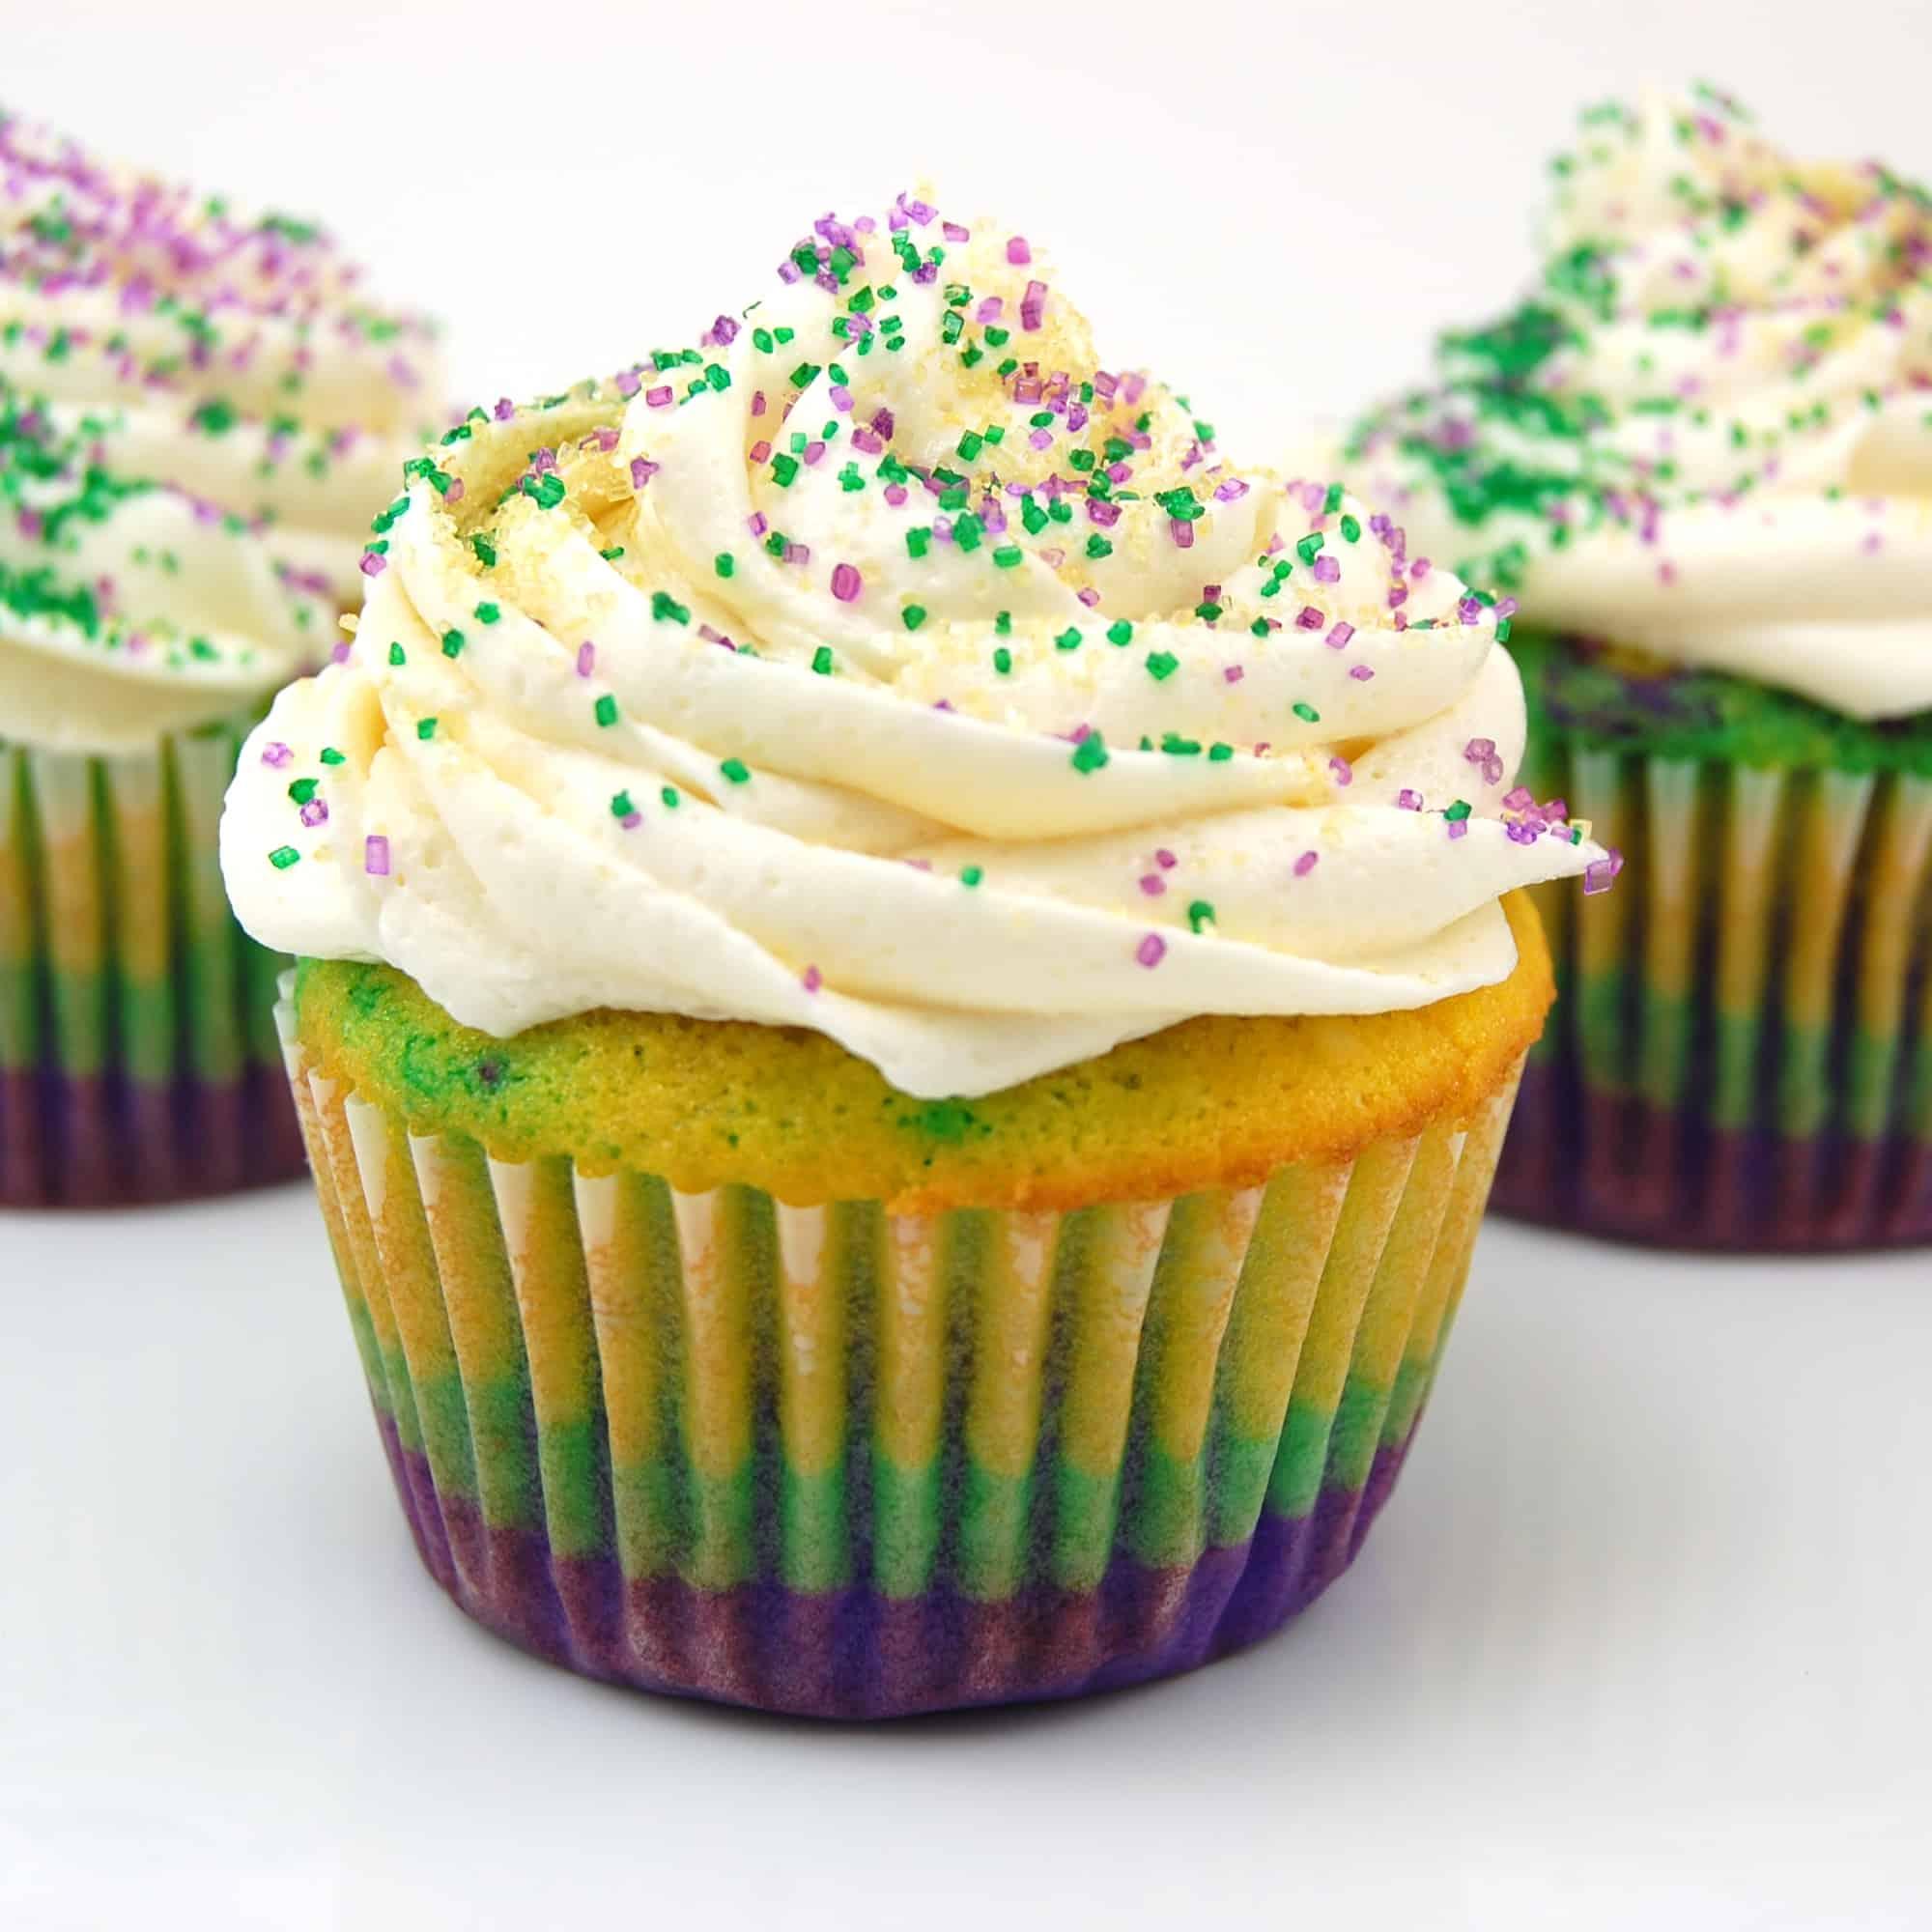 Mardi Gras cupcakes cut open